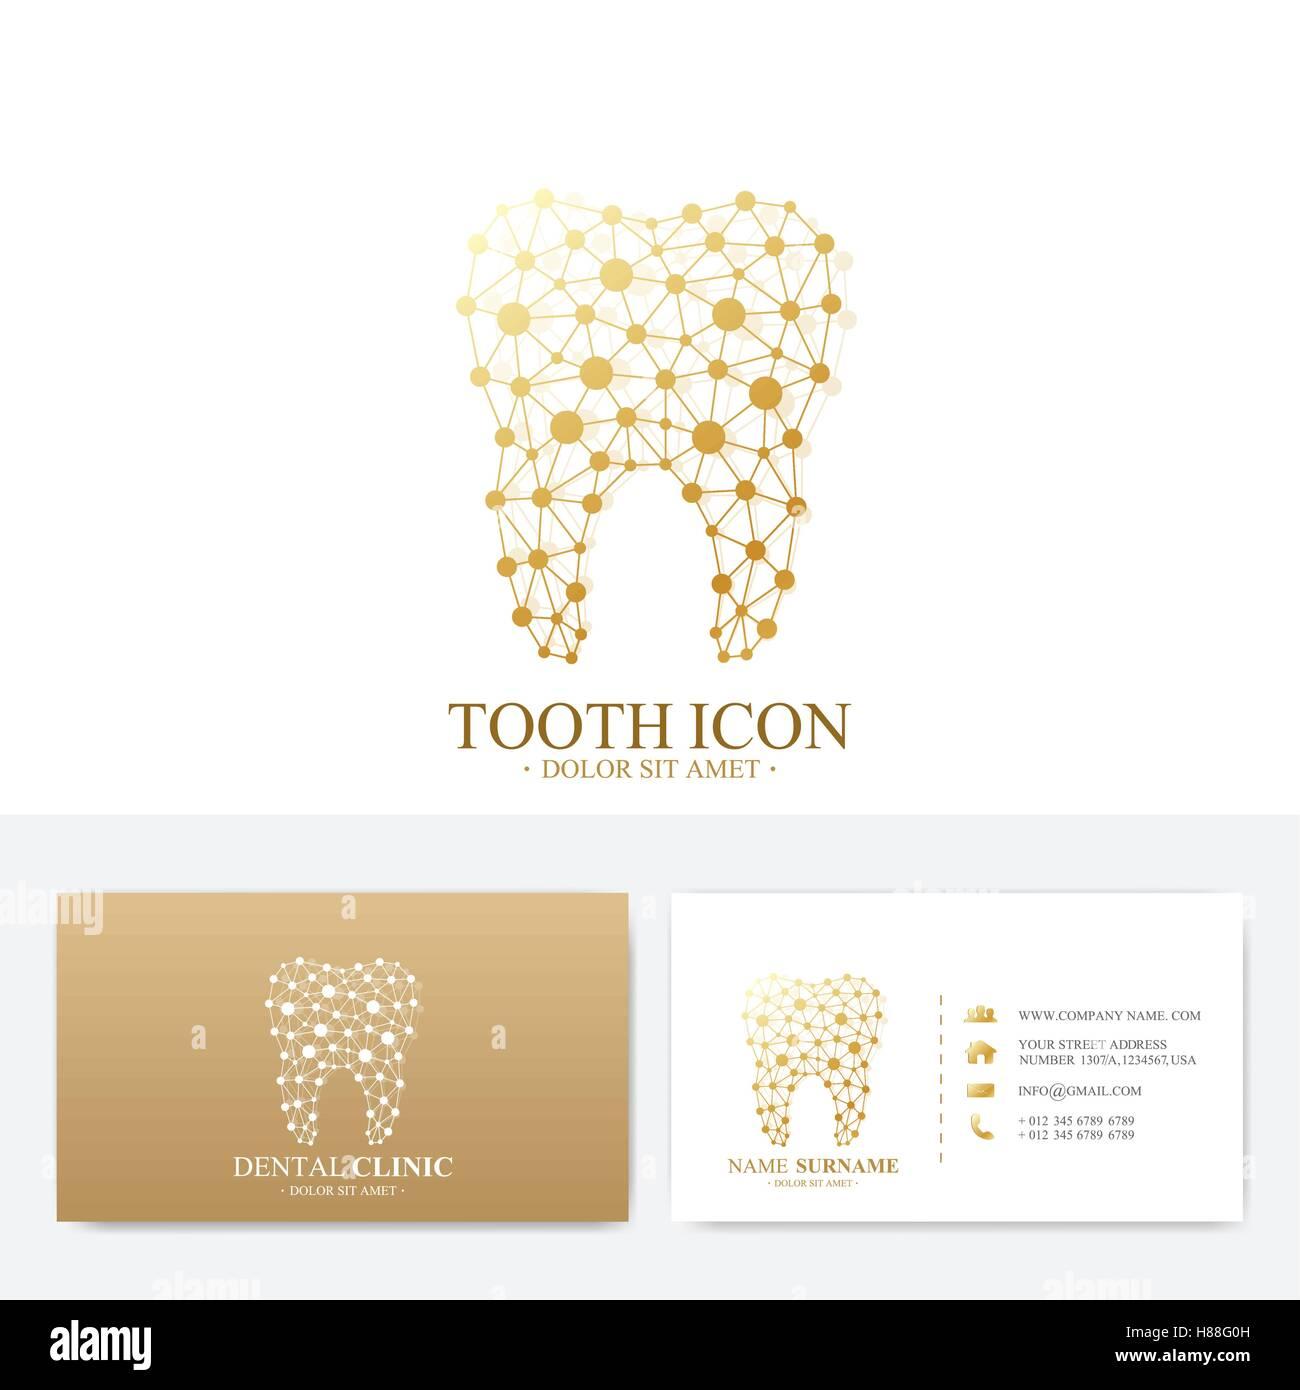 Premium Business Card Print Template Visiting Dental Clinic Card - Business card printing template